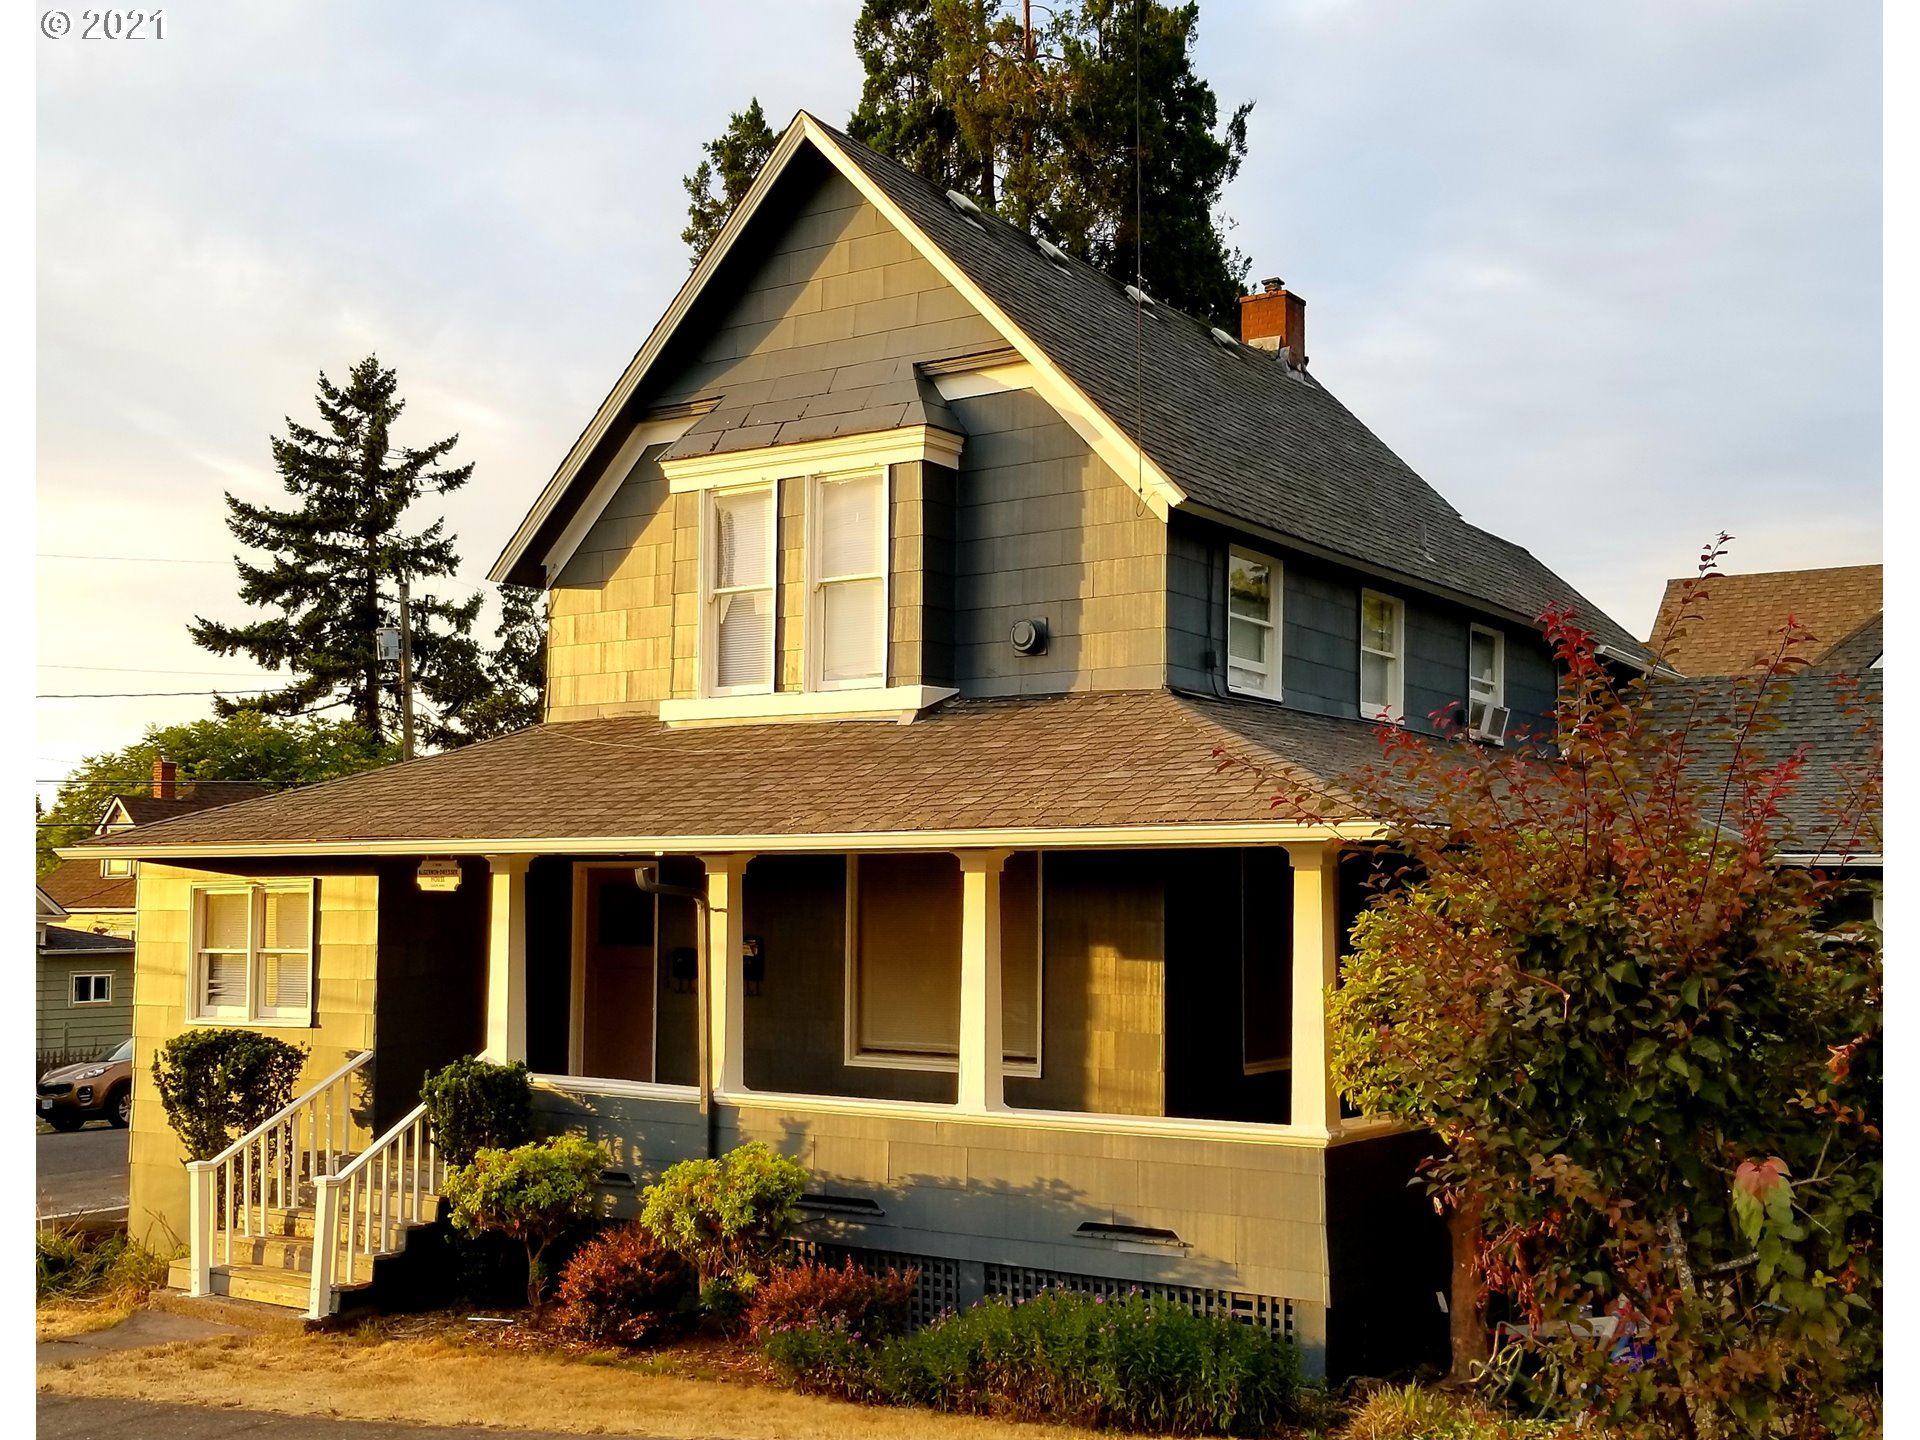 705 9TH ST, Oregon City, OR 97045 - #: 21461723